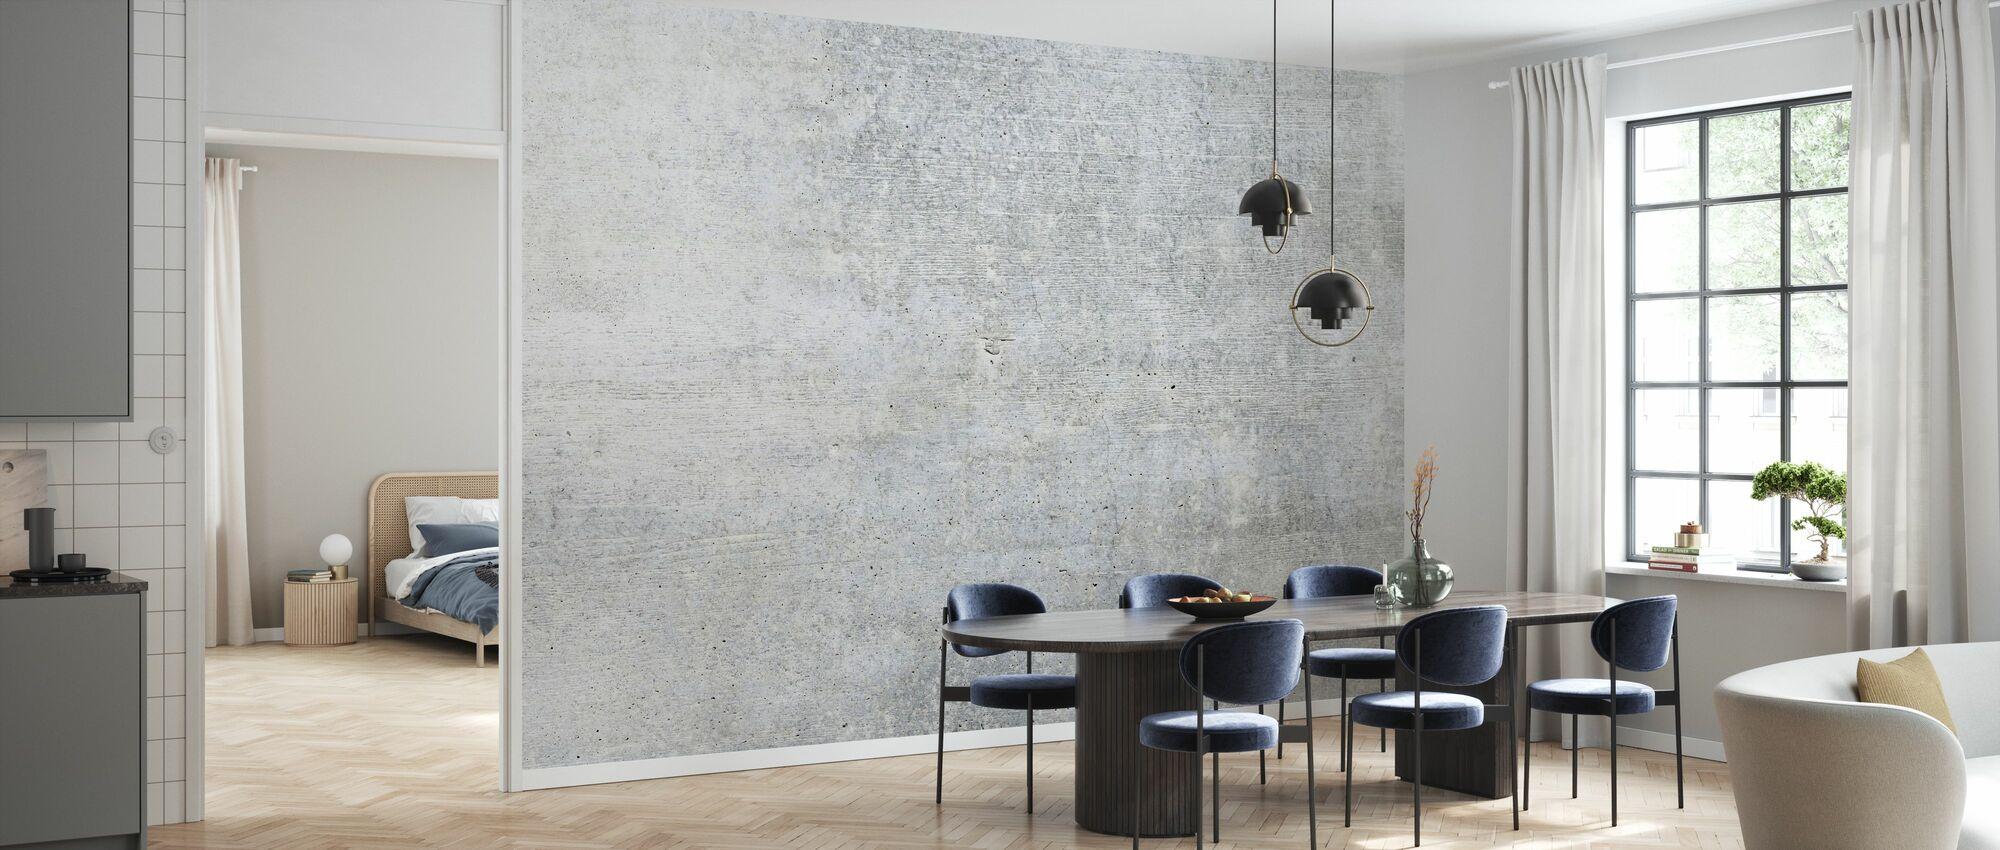 Oude grijze betonnen muur - Behang - Keuken